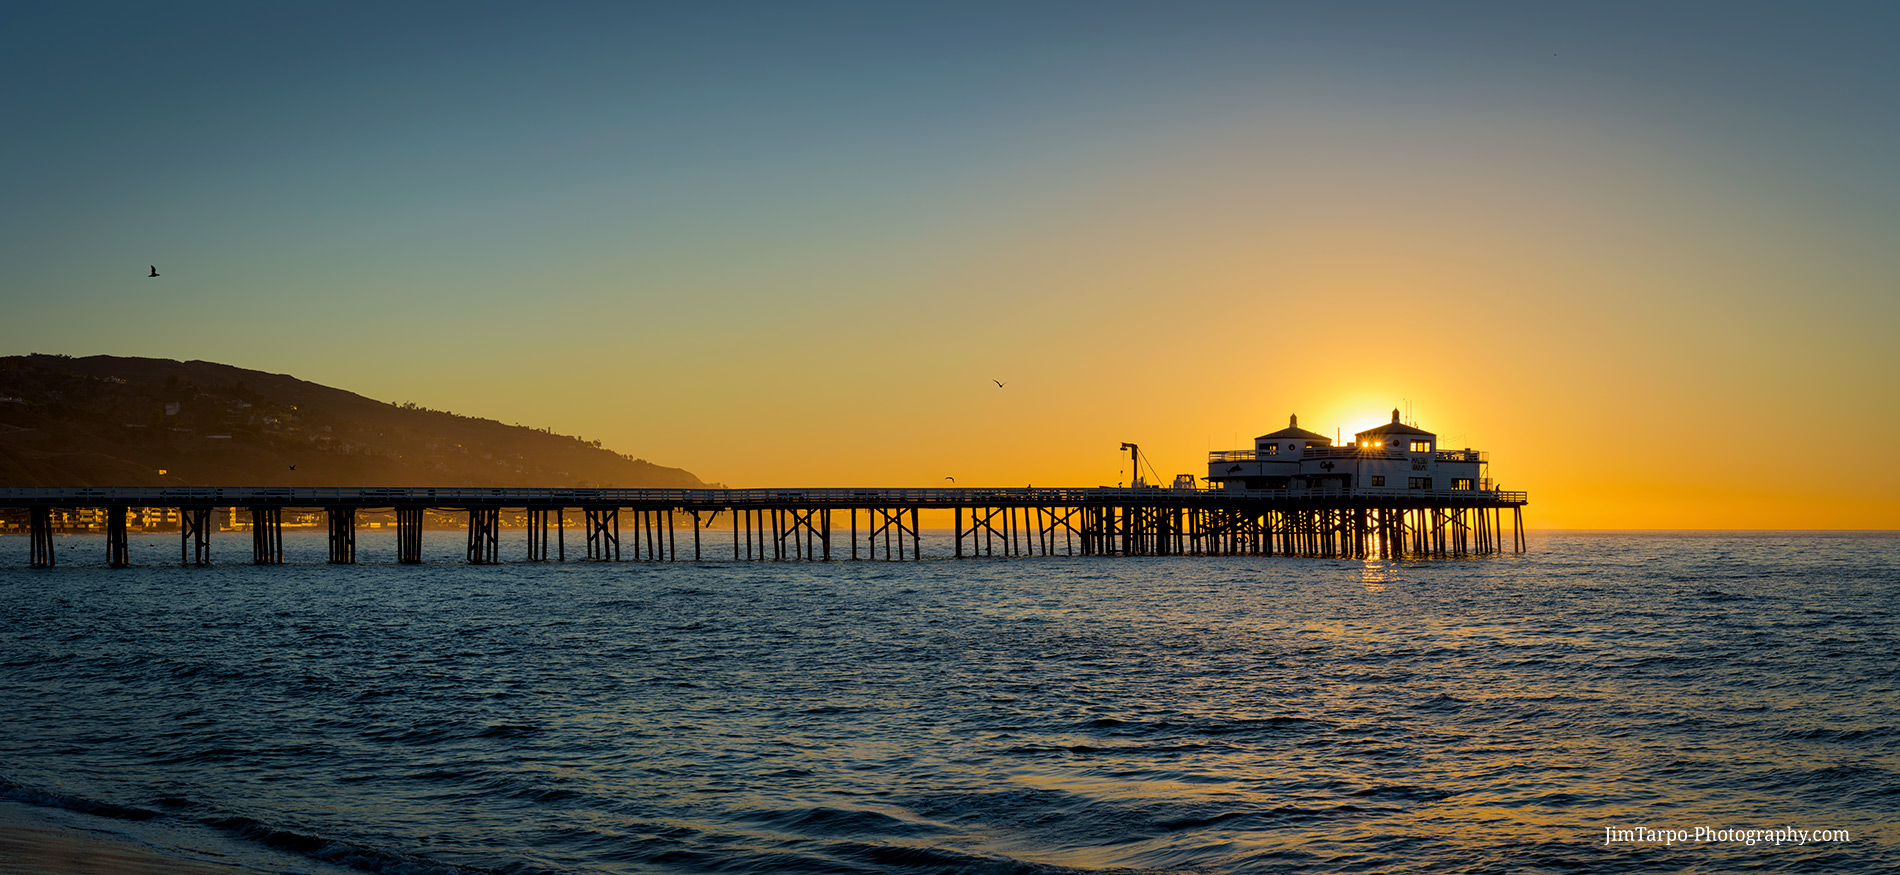 Malibu Pier Sunrise